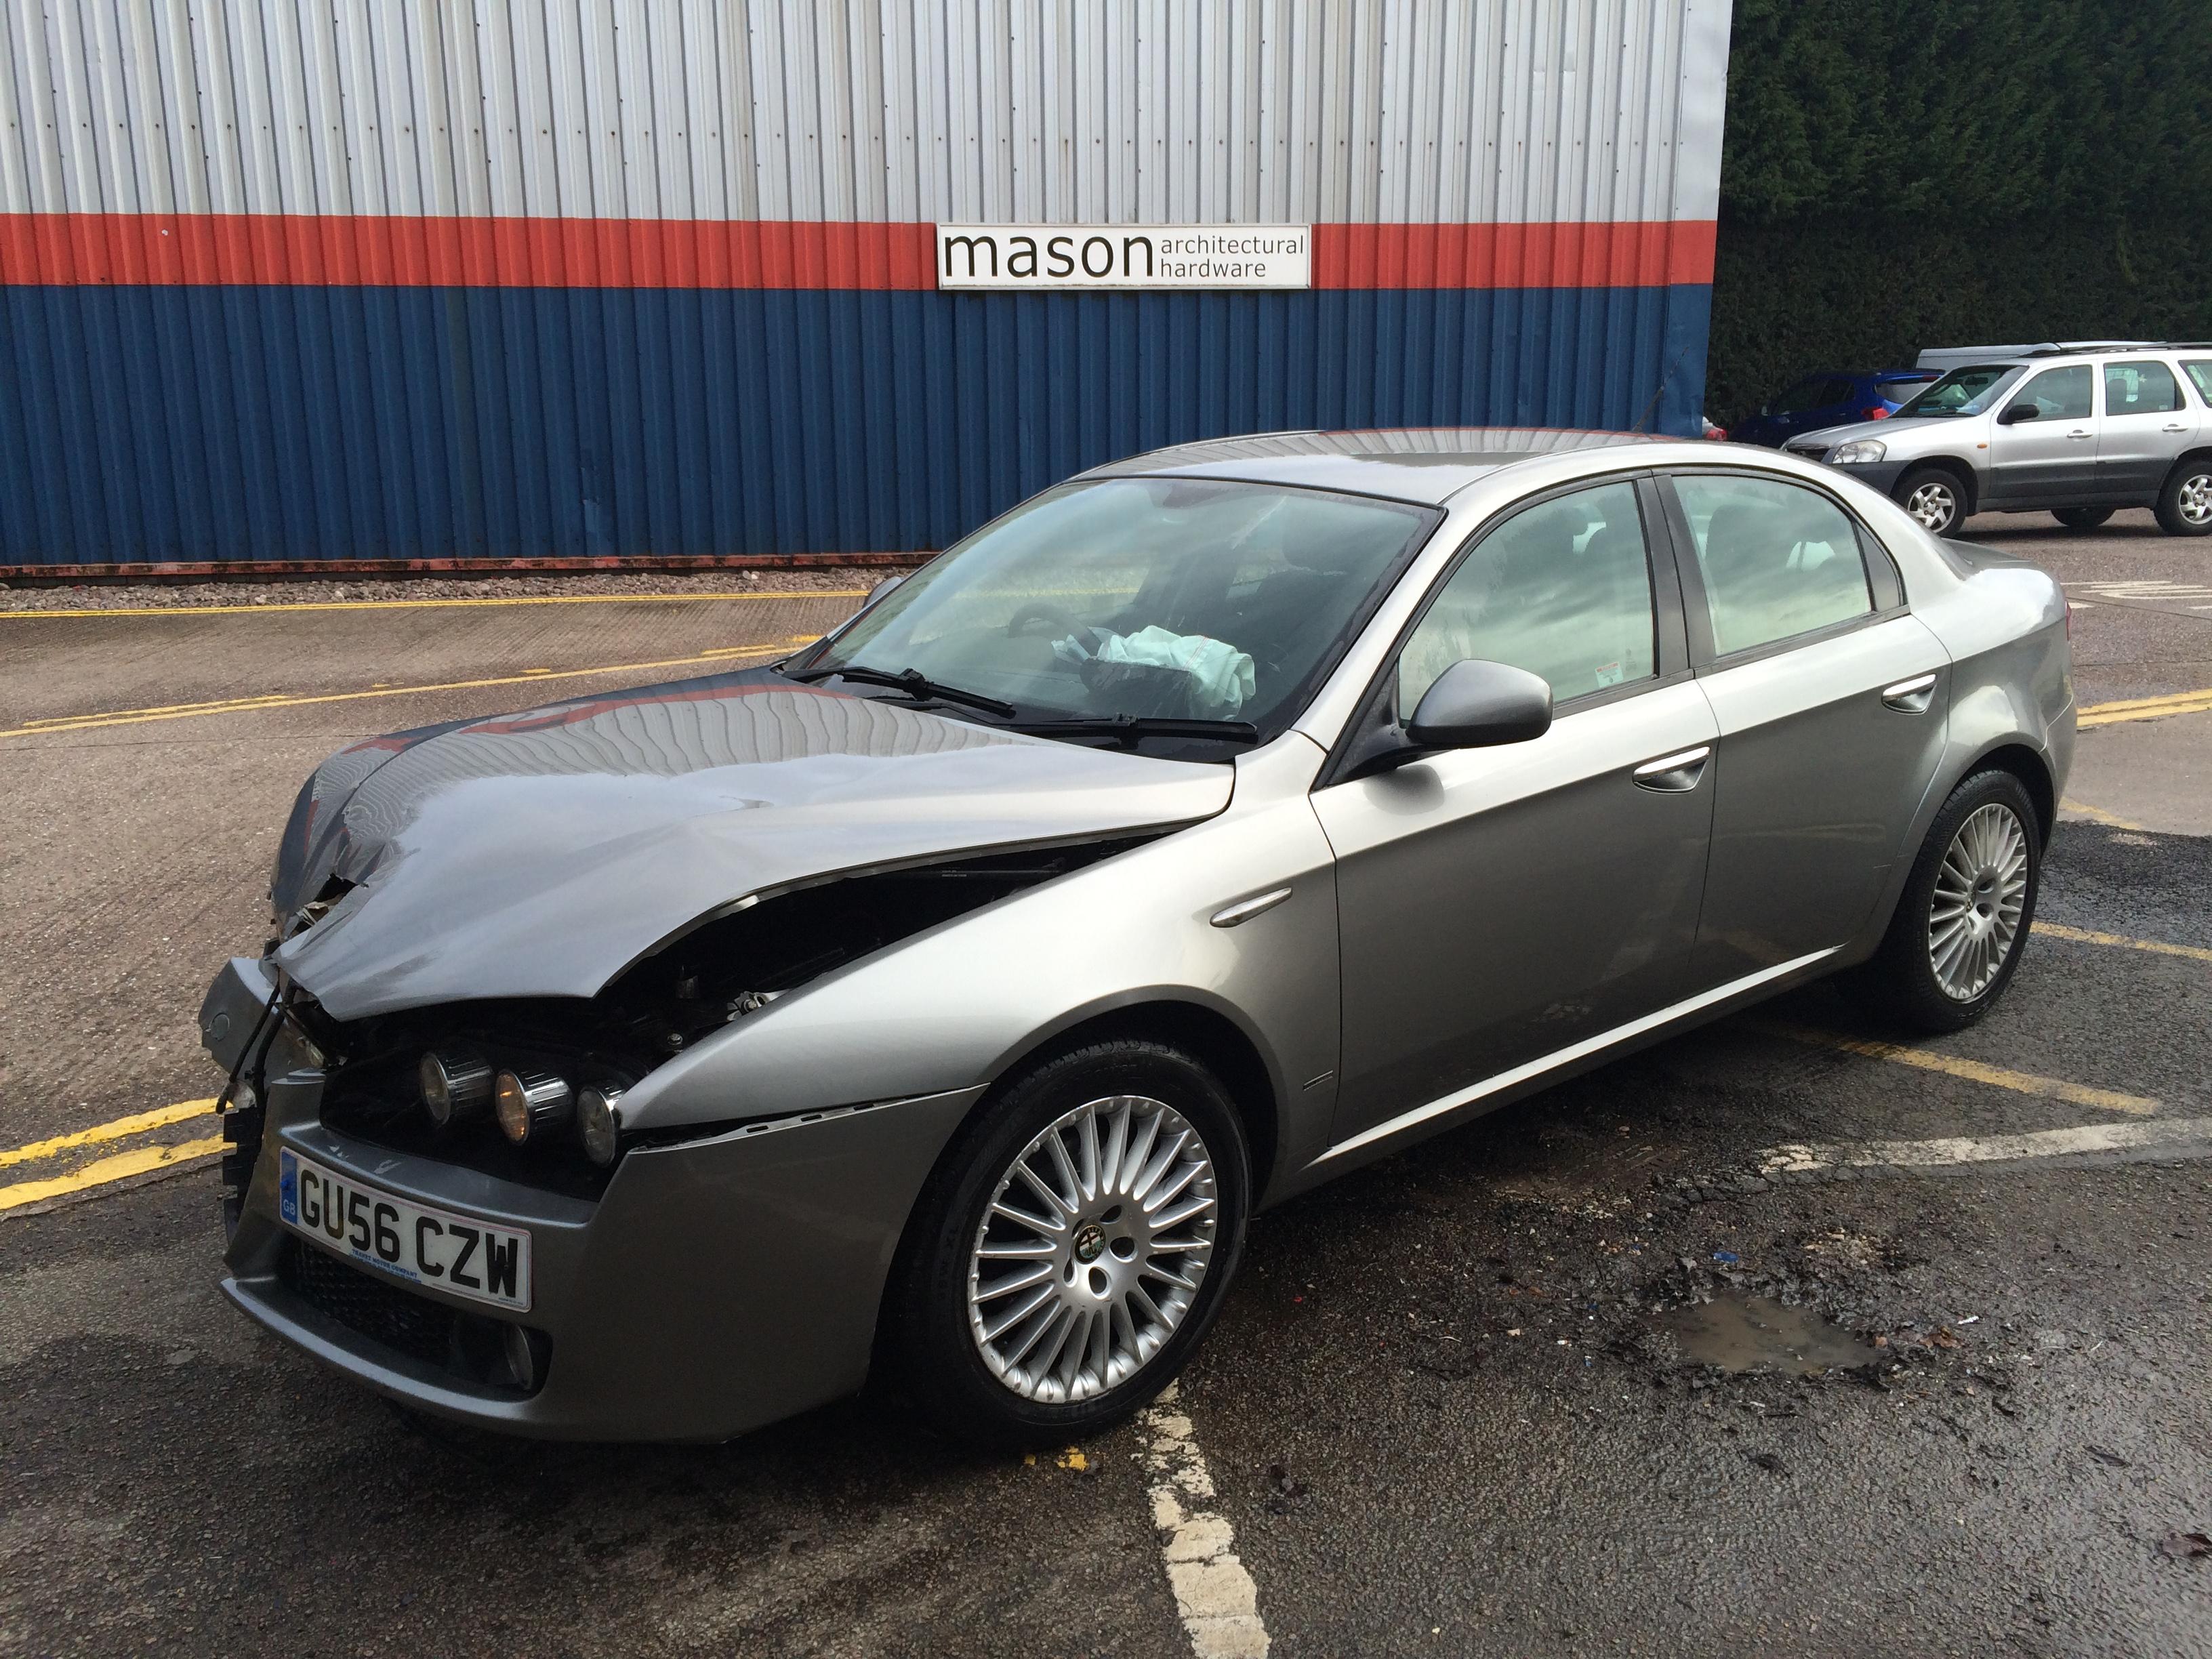 Alfa romeo gt 3 2 v6 breaking for spares italia auto parts - 159 1 9 Jtdm Saloon Grey Italia Auto Parts